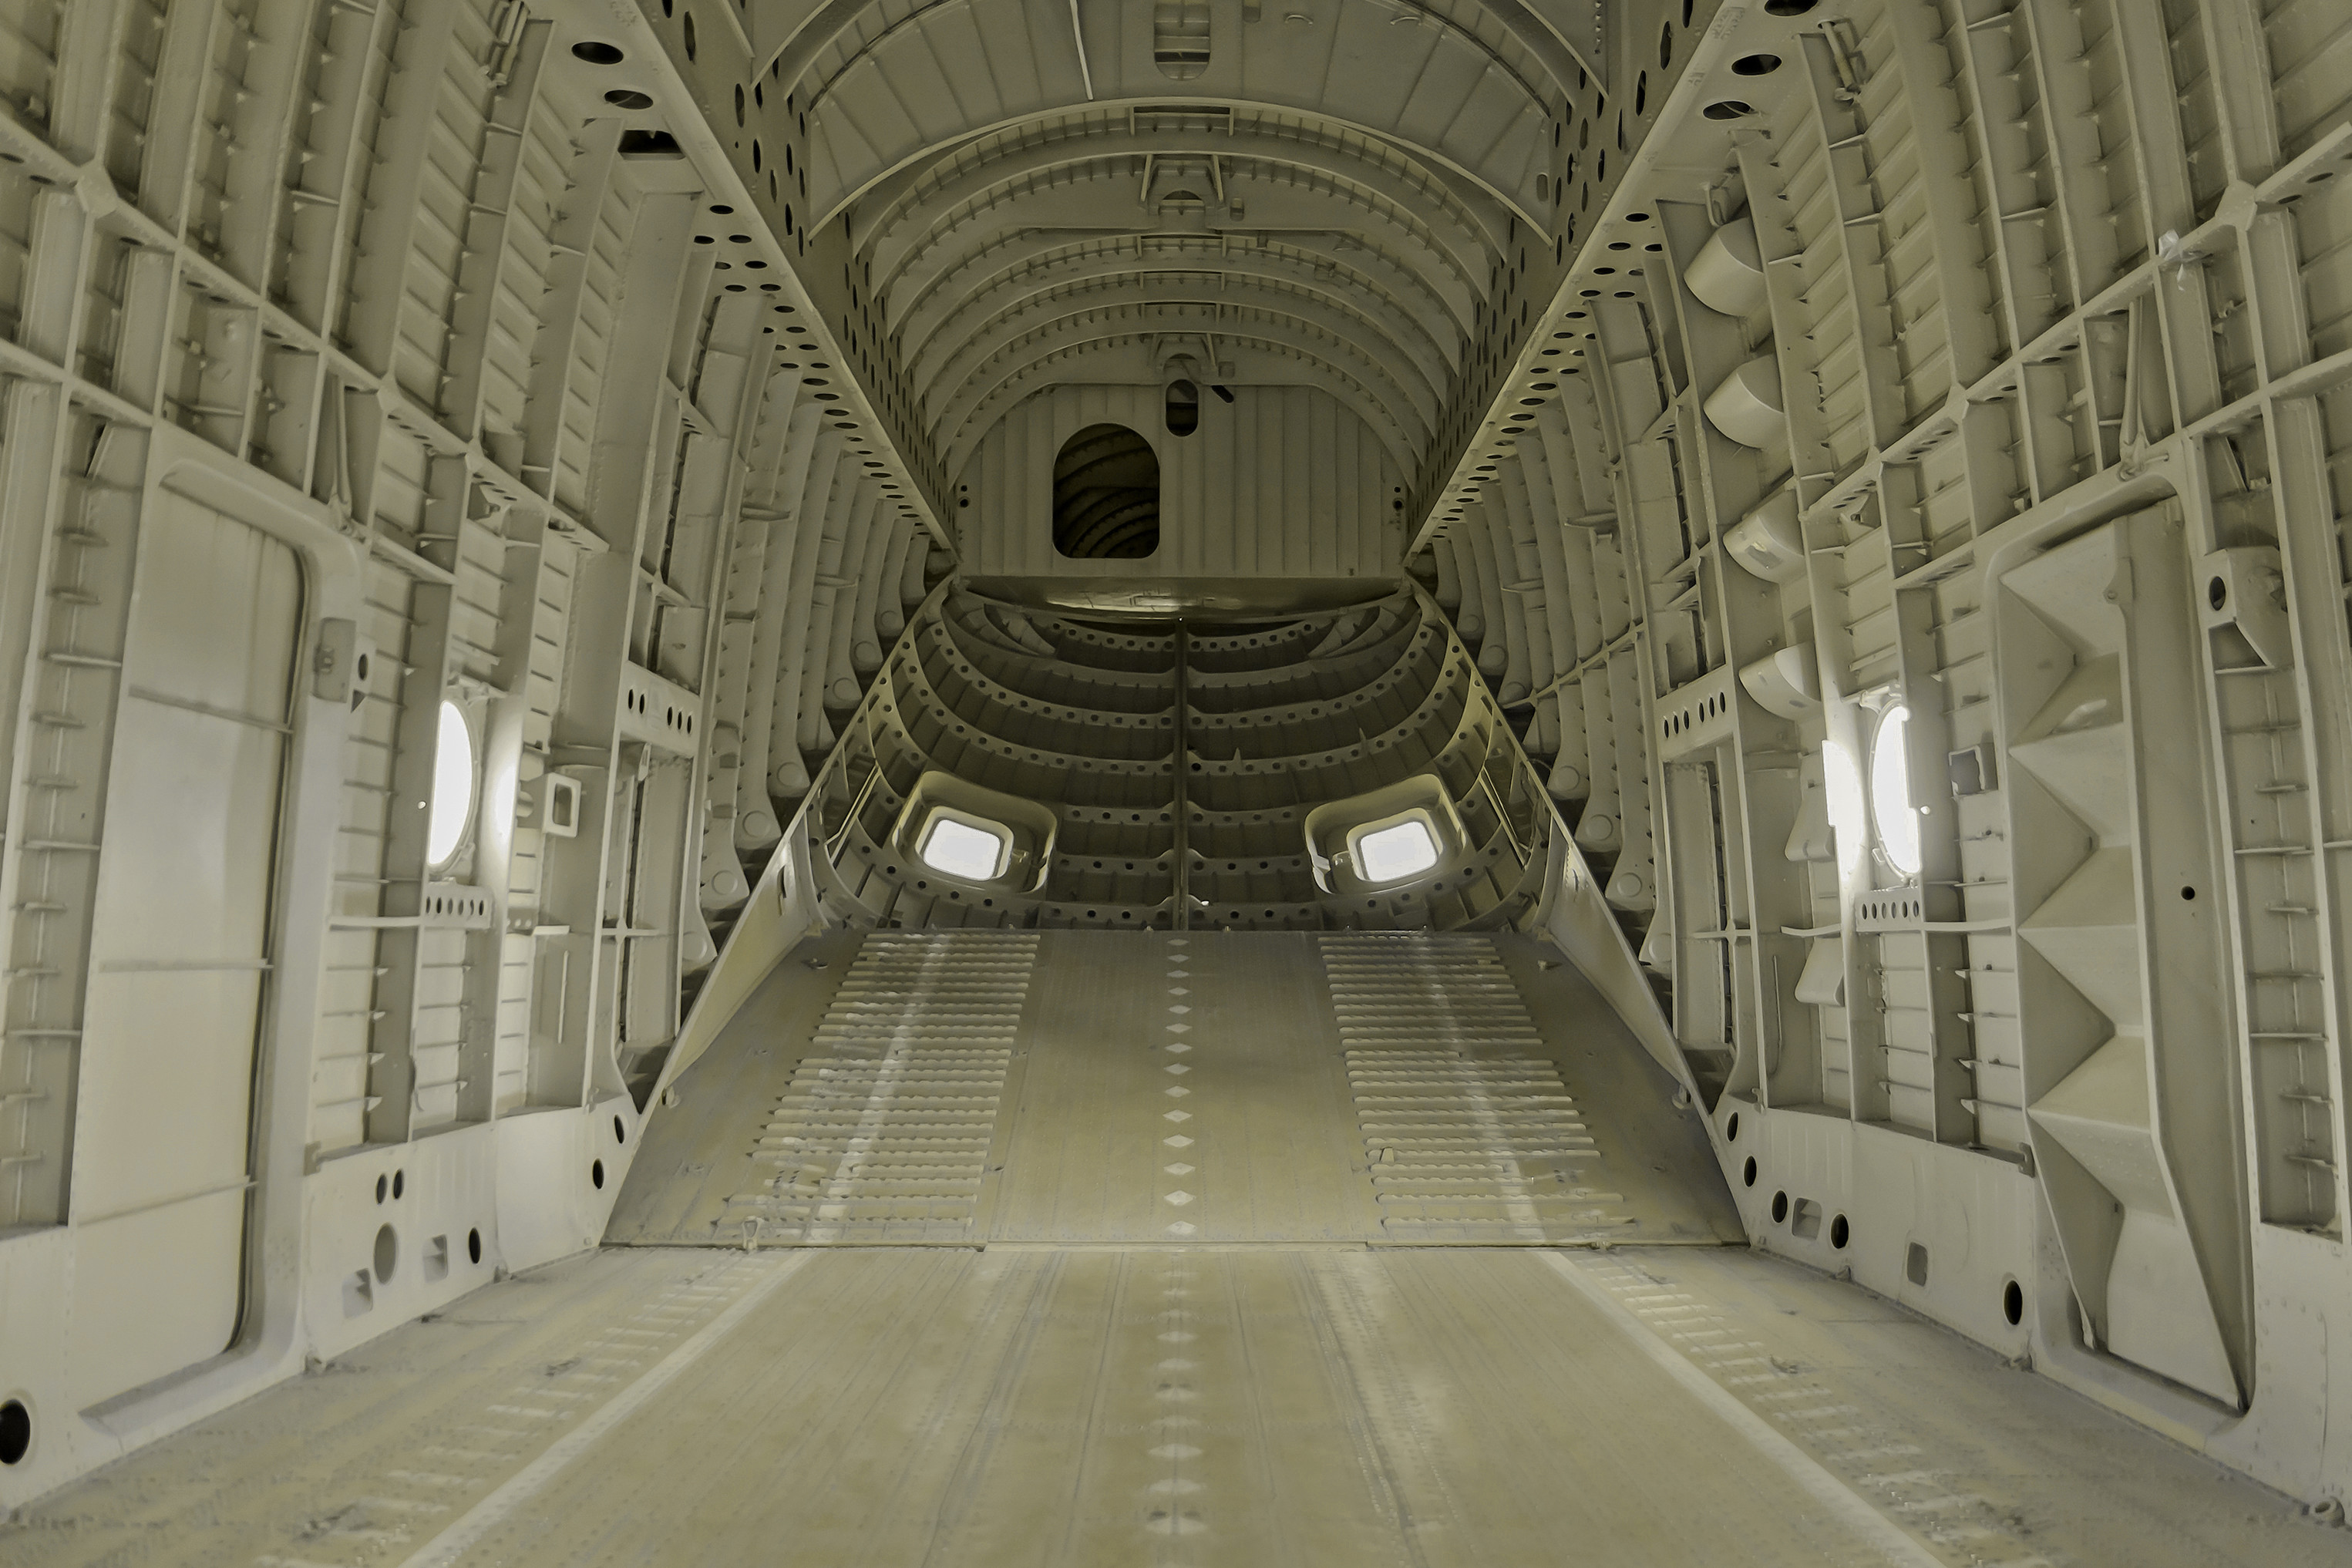 Aft bulkhead and main cargo entrance.